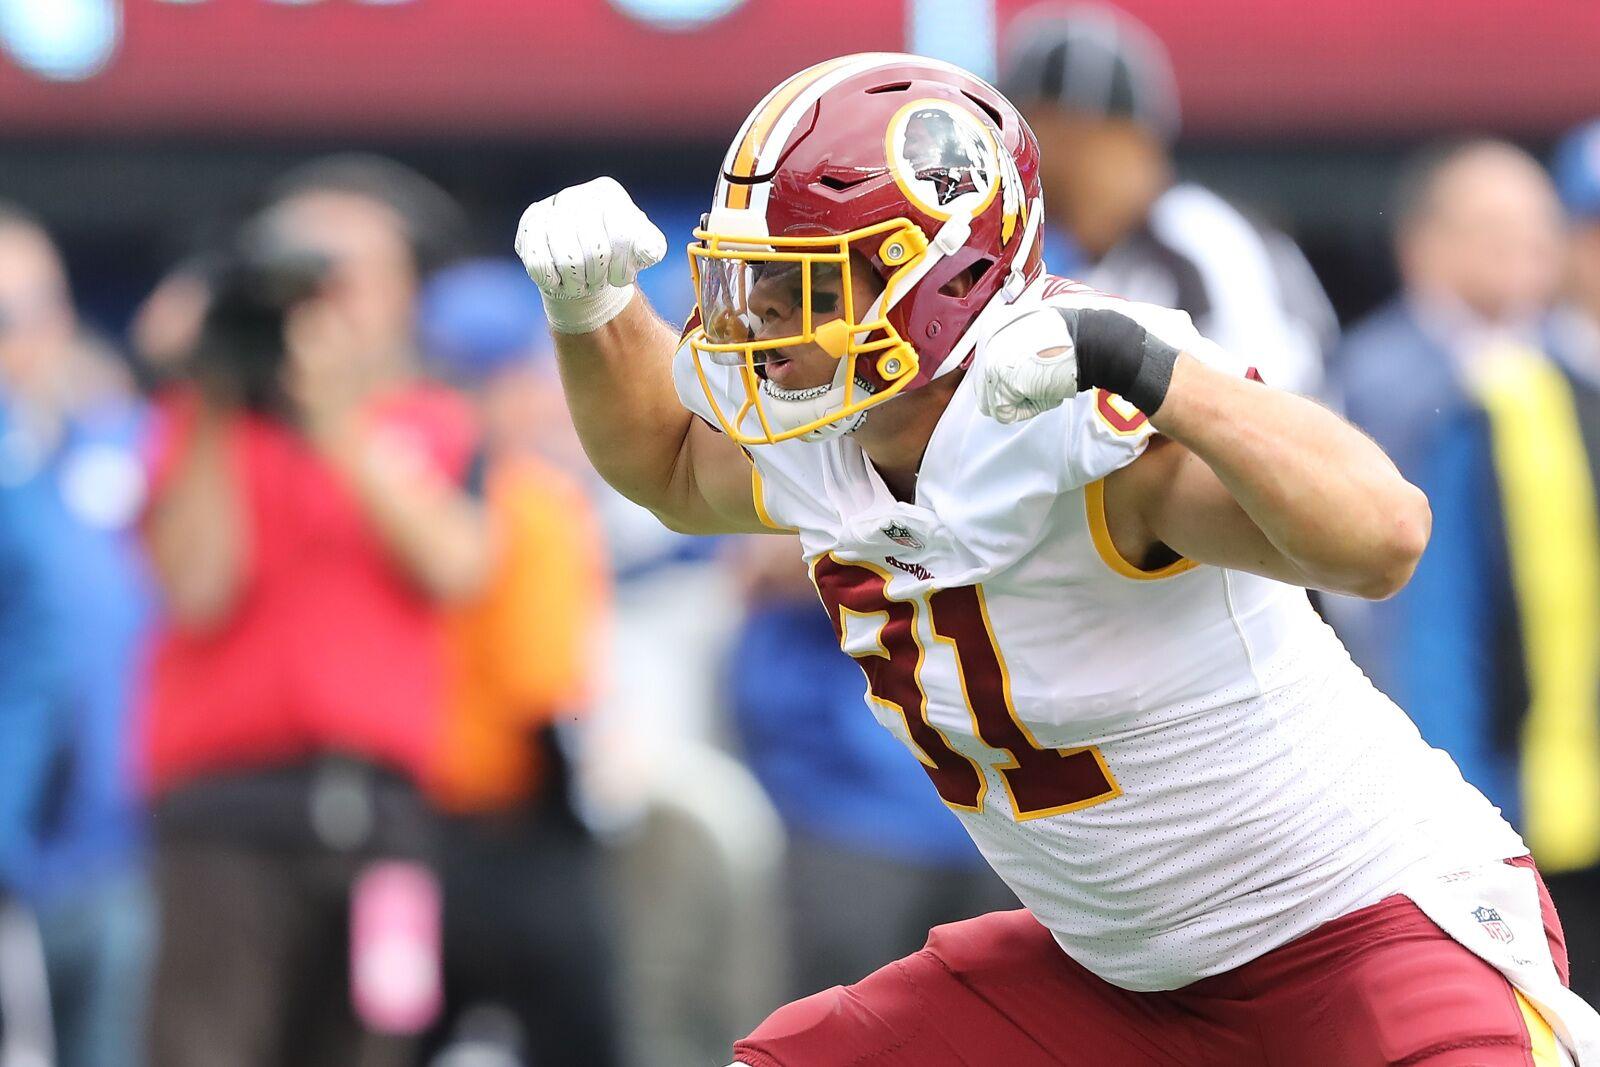 Washington Redskins: Tracking Ryan Kerrigan's path to the Hall of Fame